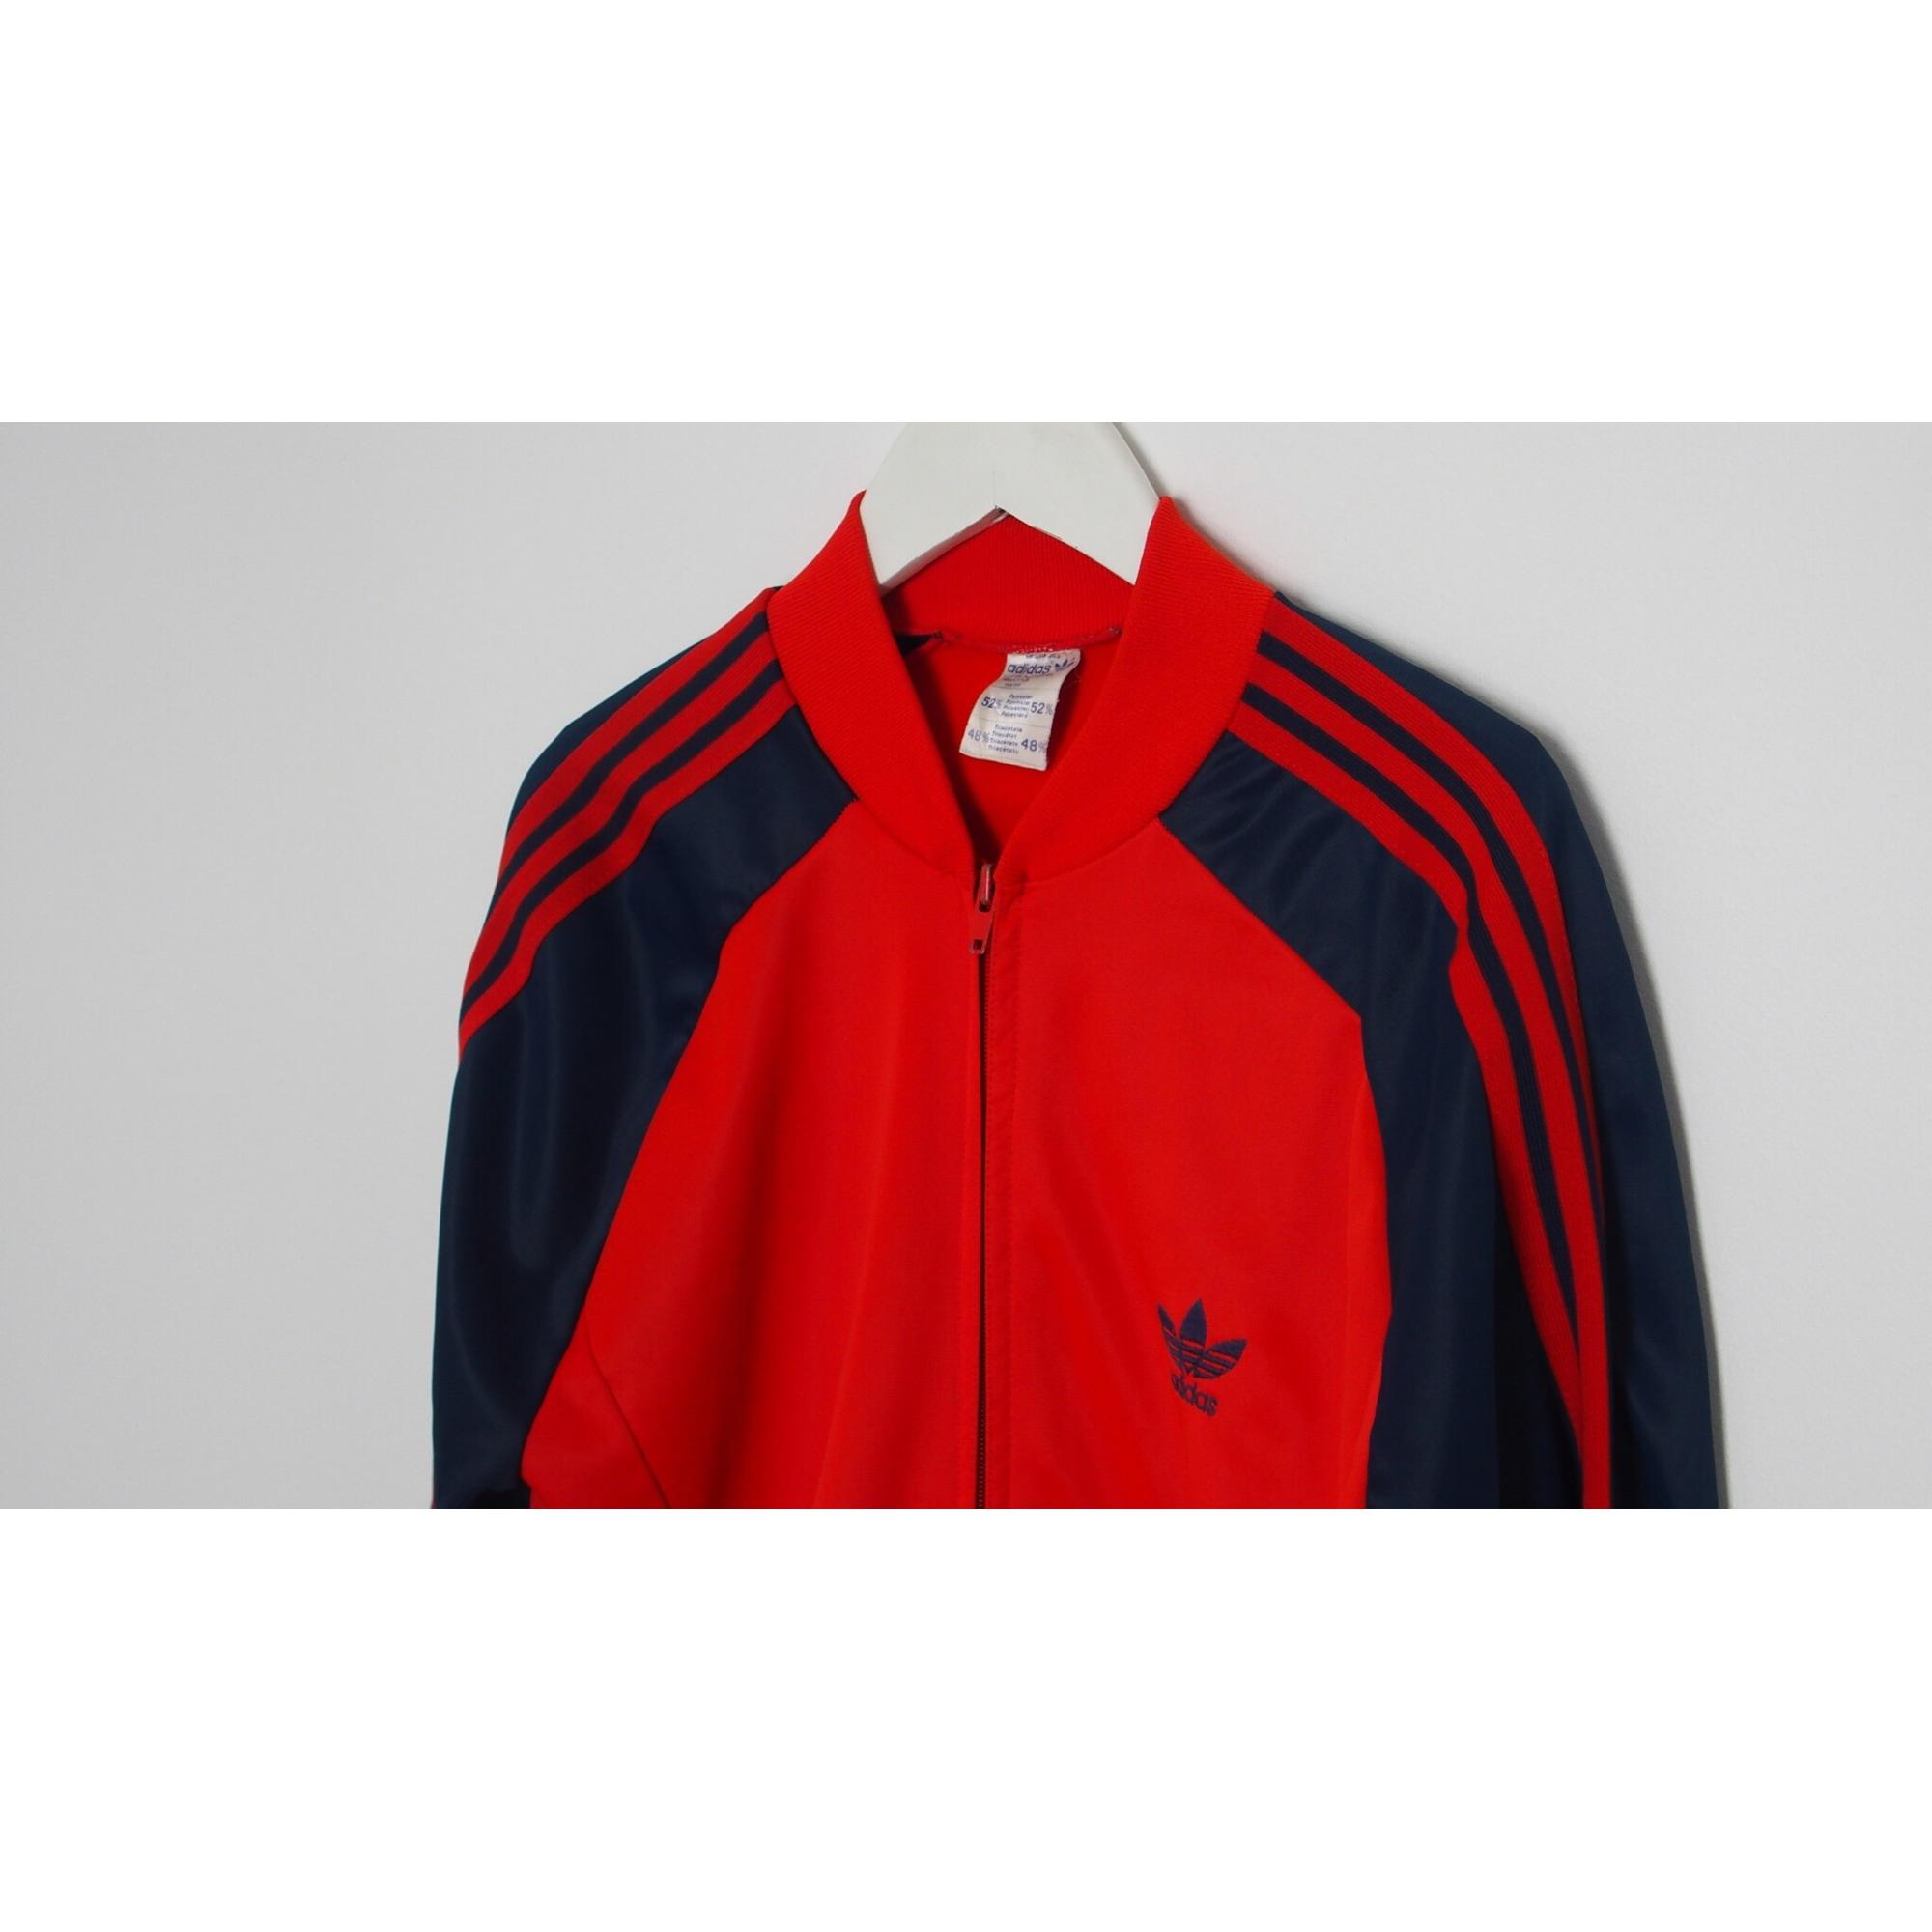 Adidas Bordeaix Rouge Bordeaix Veste Adidas Rouge Adidas Veste ED9WH2I